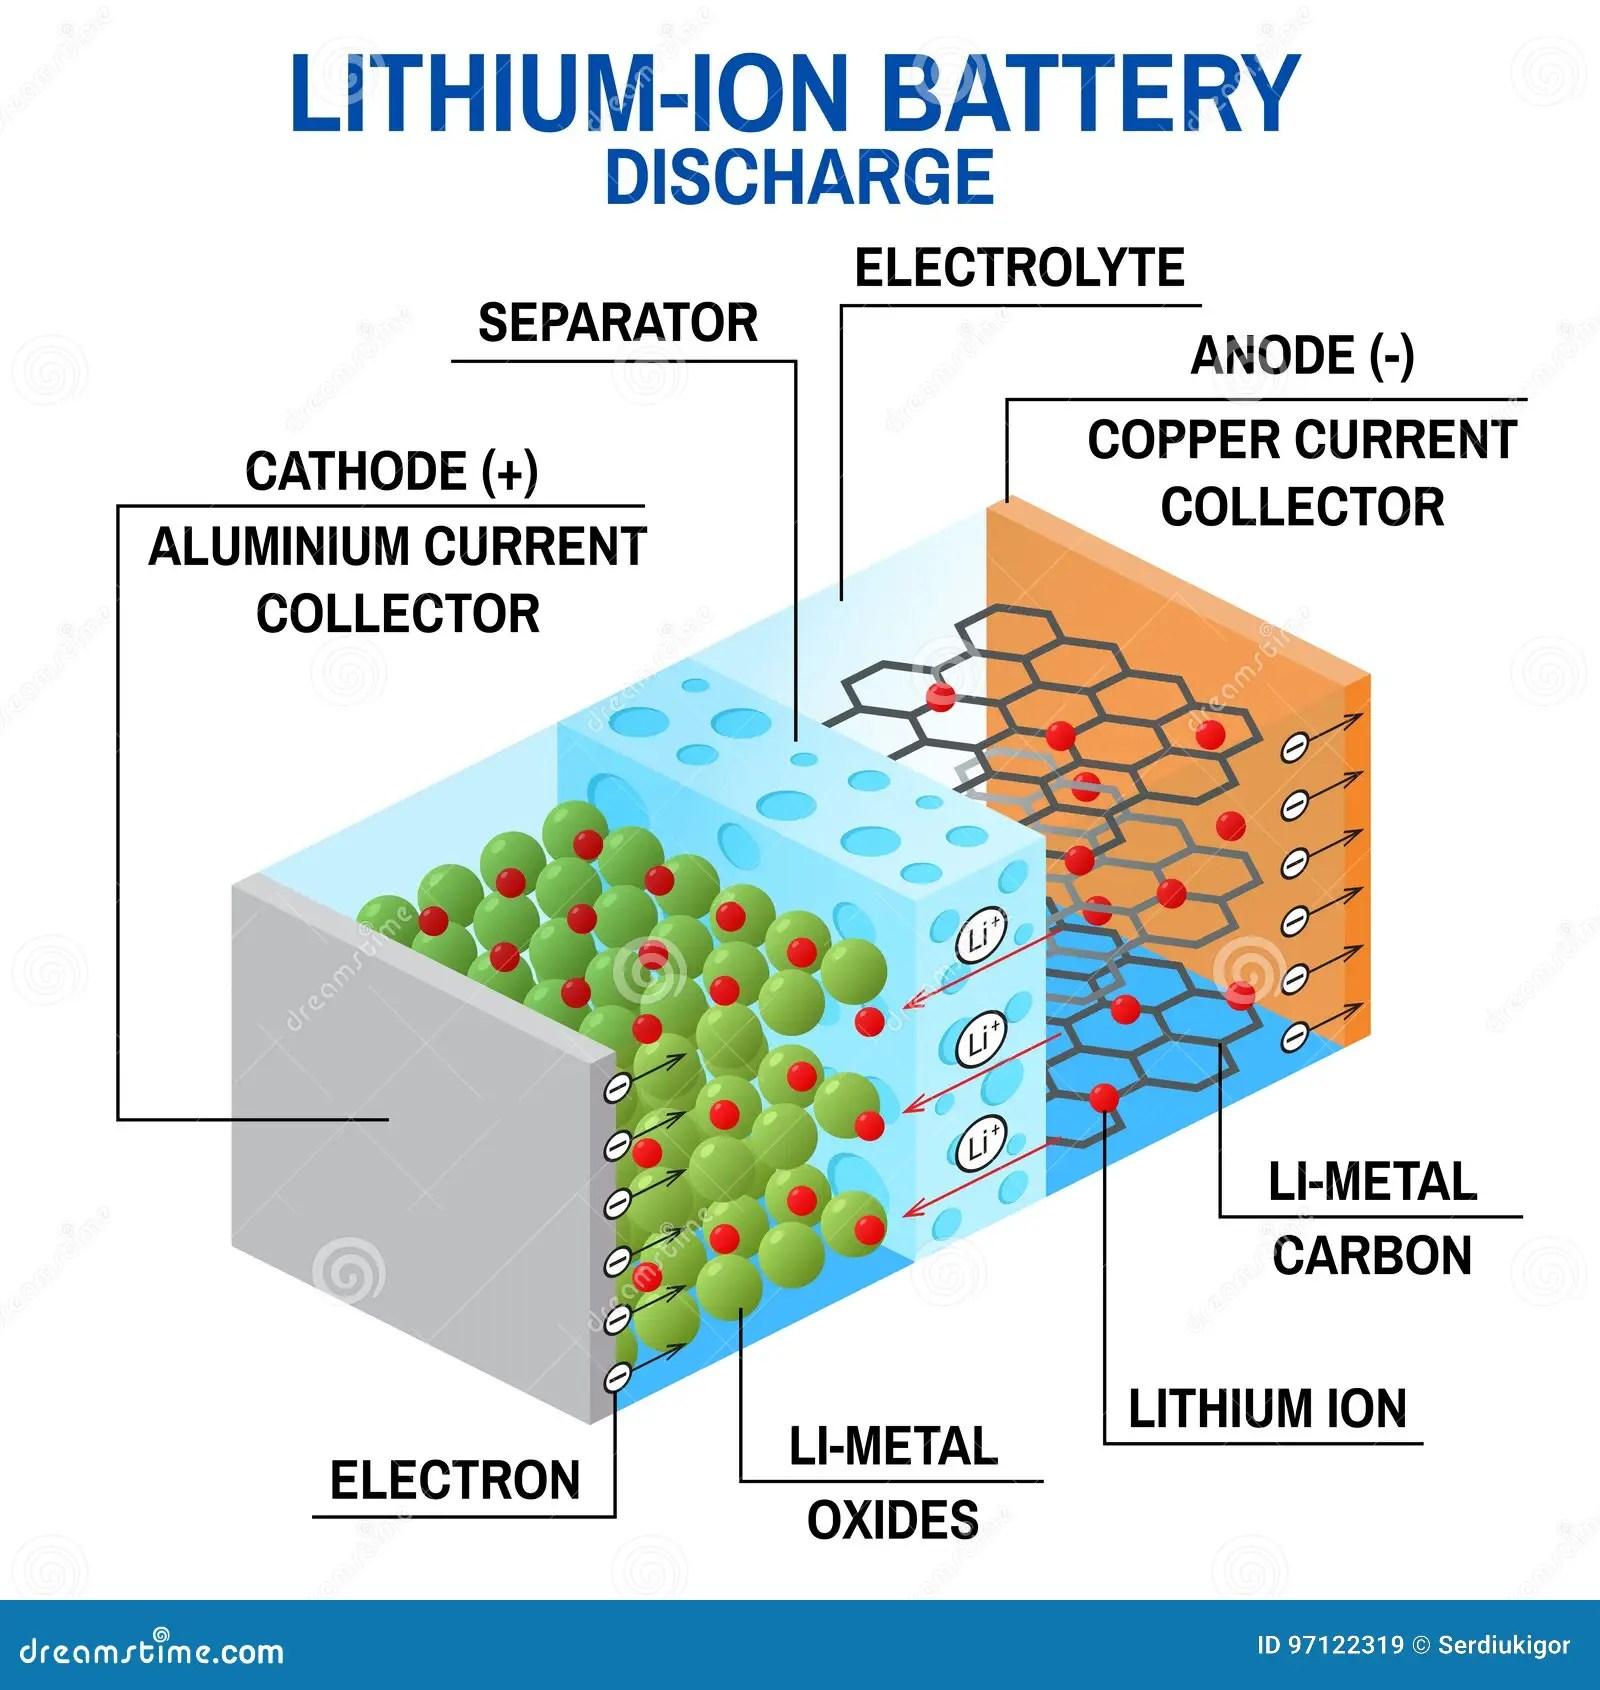 lithium ion cell diagram 1990 honda accord brake light wiring 022 awosurk de li battery stock vector illustration of icon 97122319 rh dreamstime com